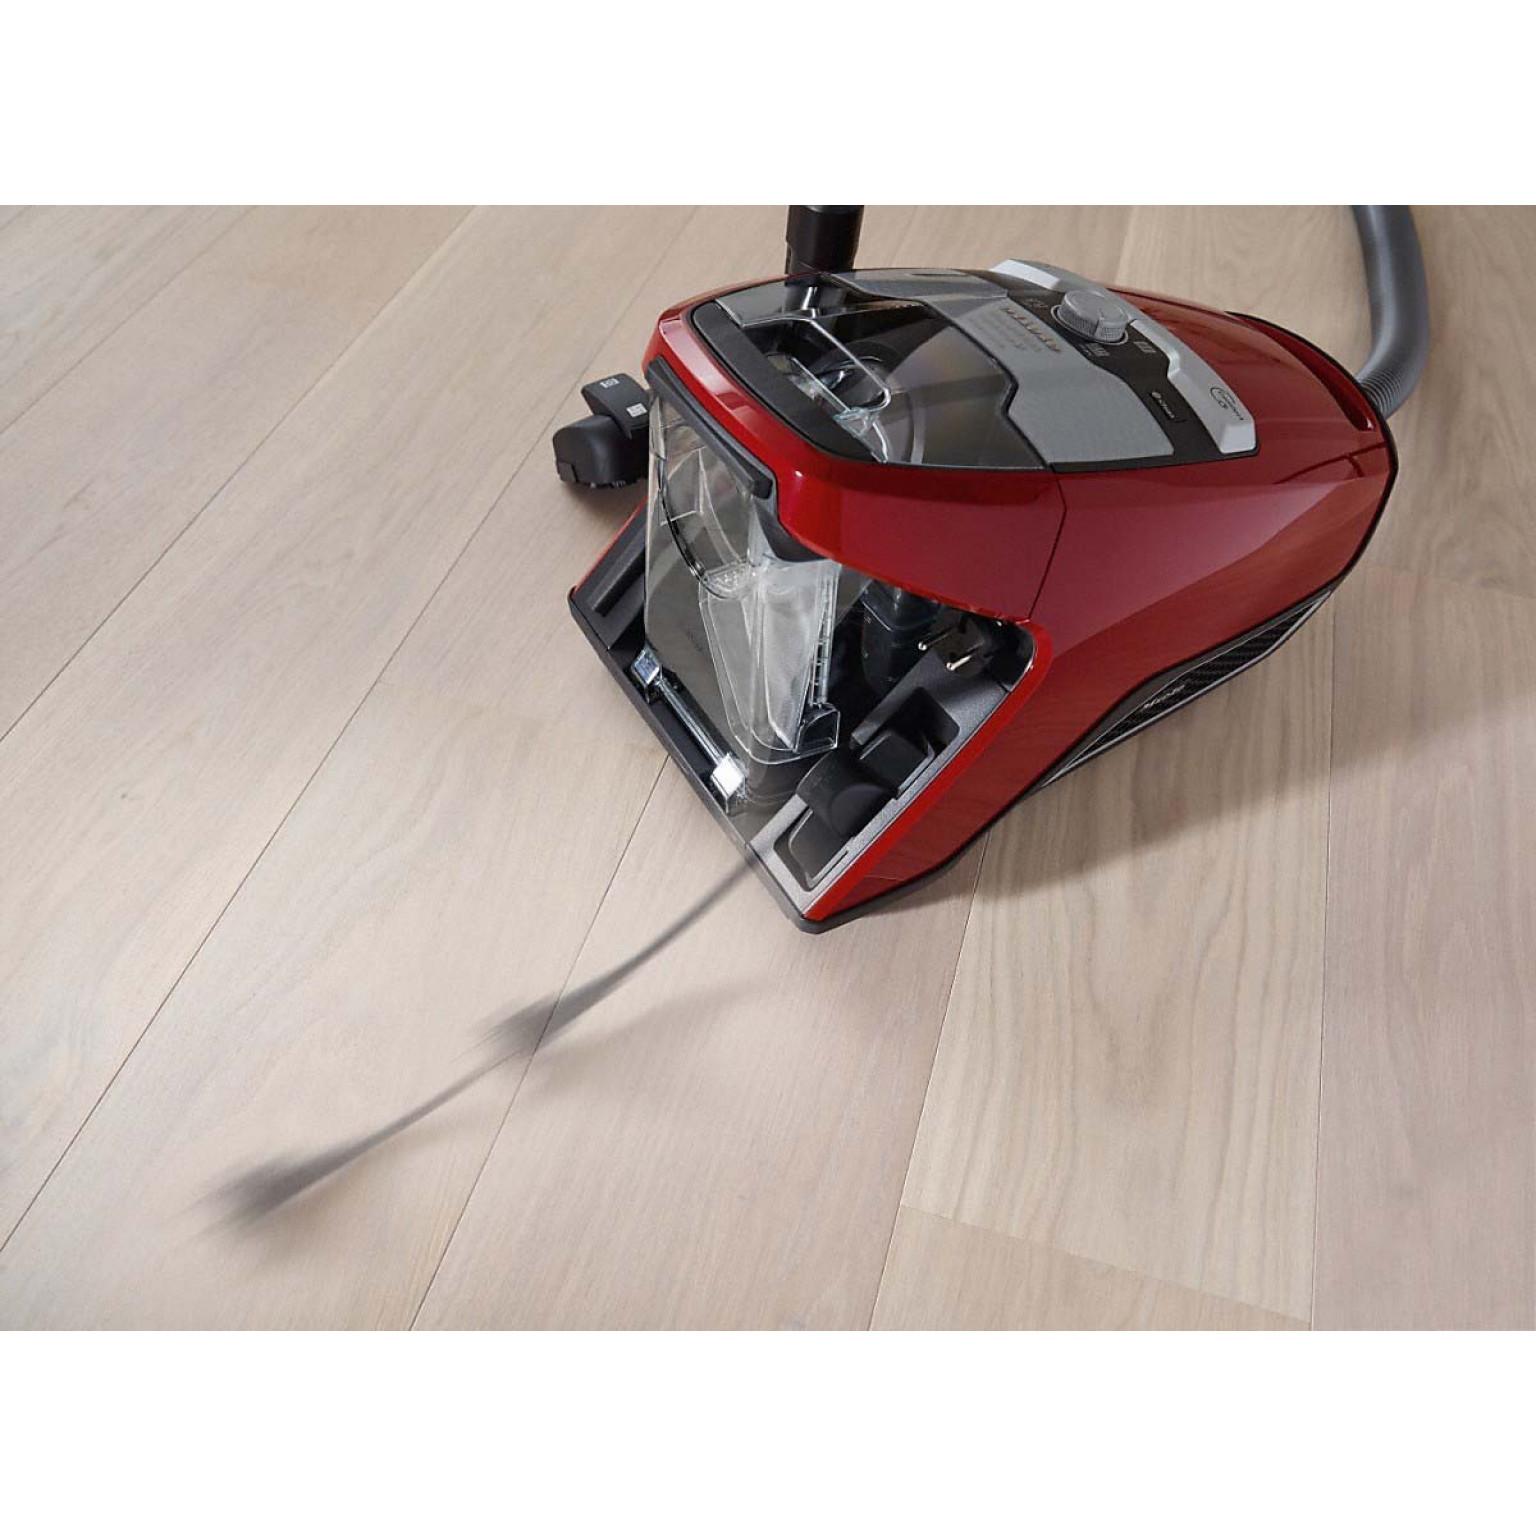 Miele Blizzard Cx1 Cat & Dog Powerline Vacuum Cleaner